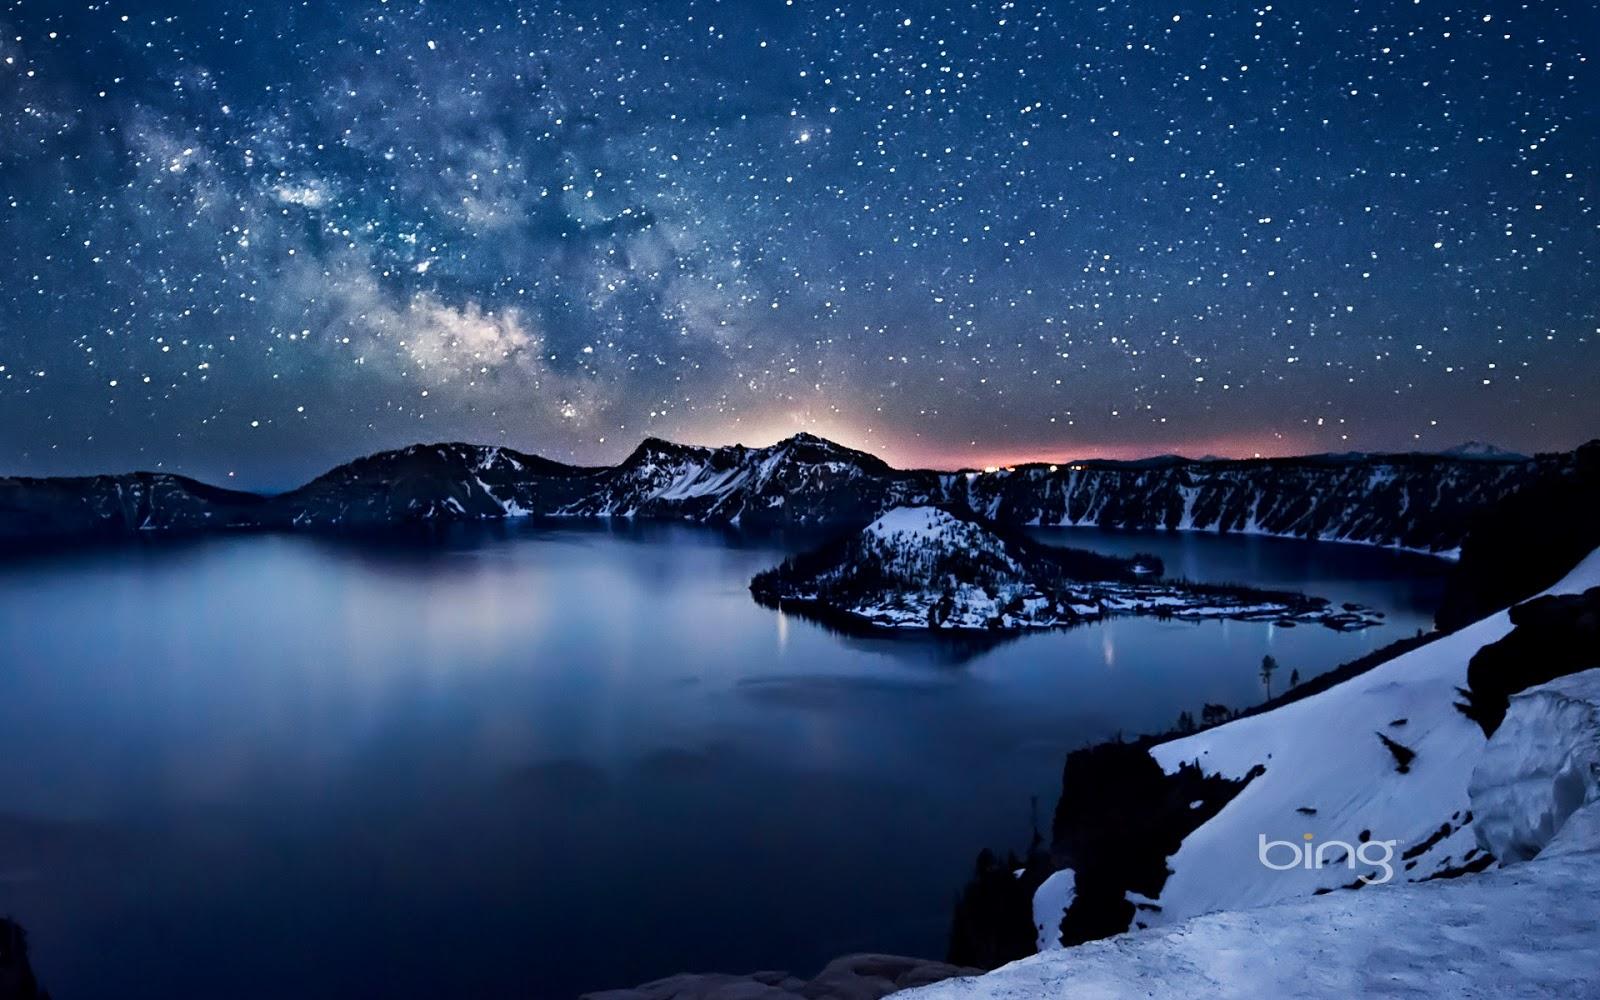 Milky Way above Crater Lake Oregon Nagesh Mahadev 1600x1000